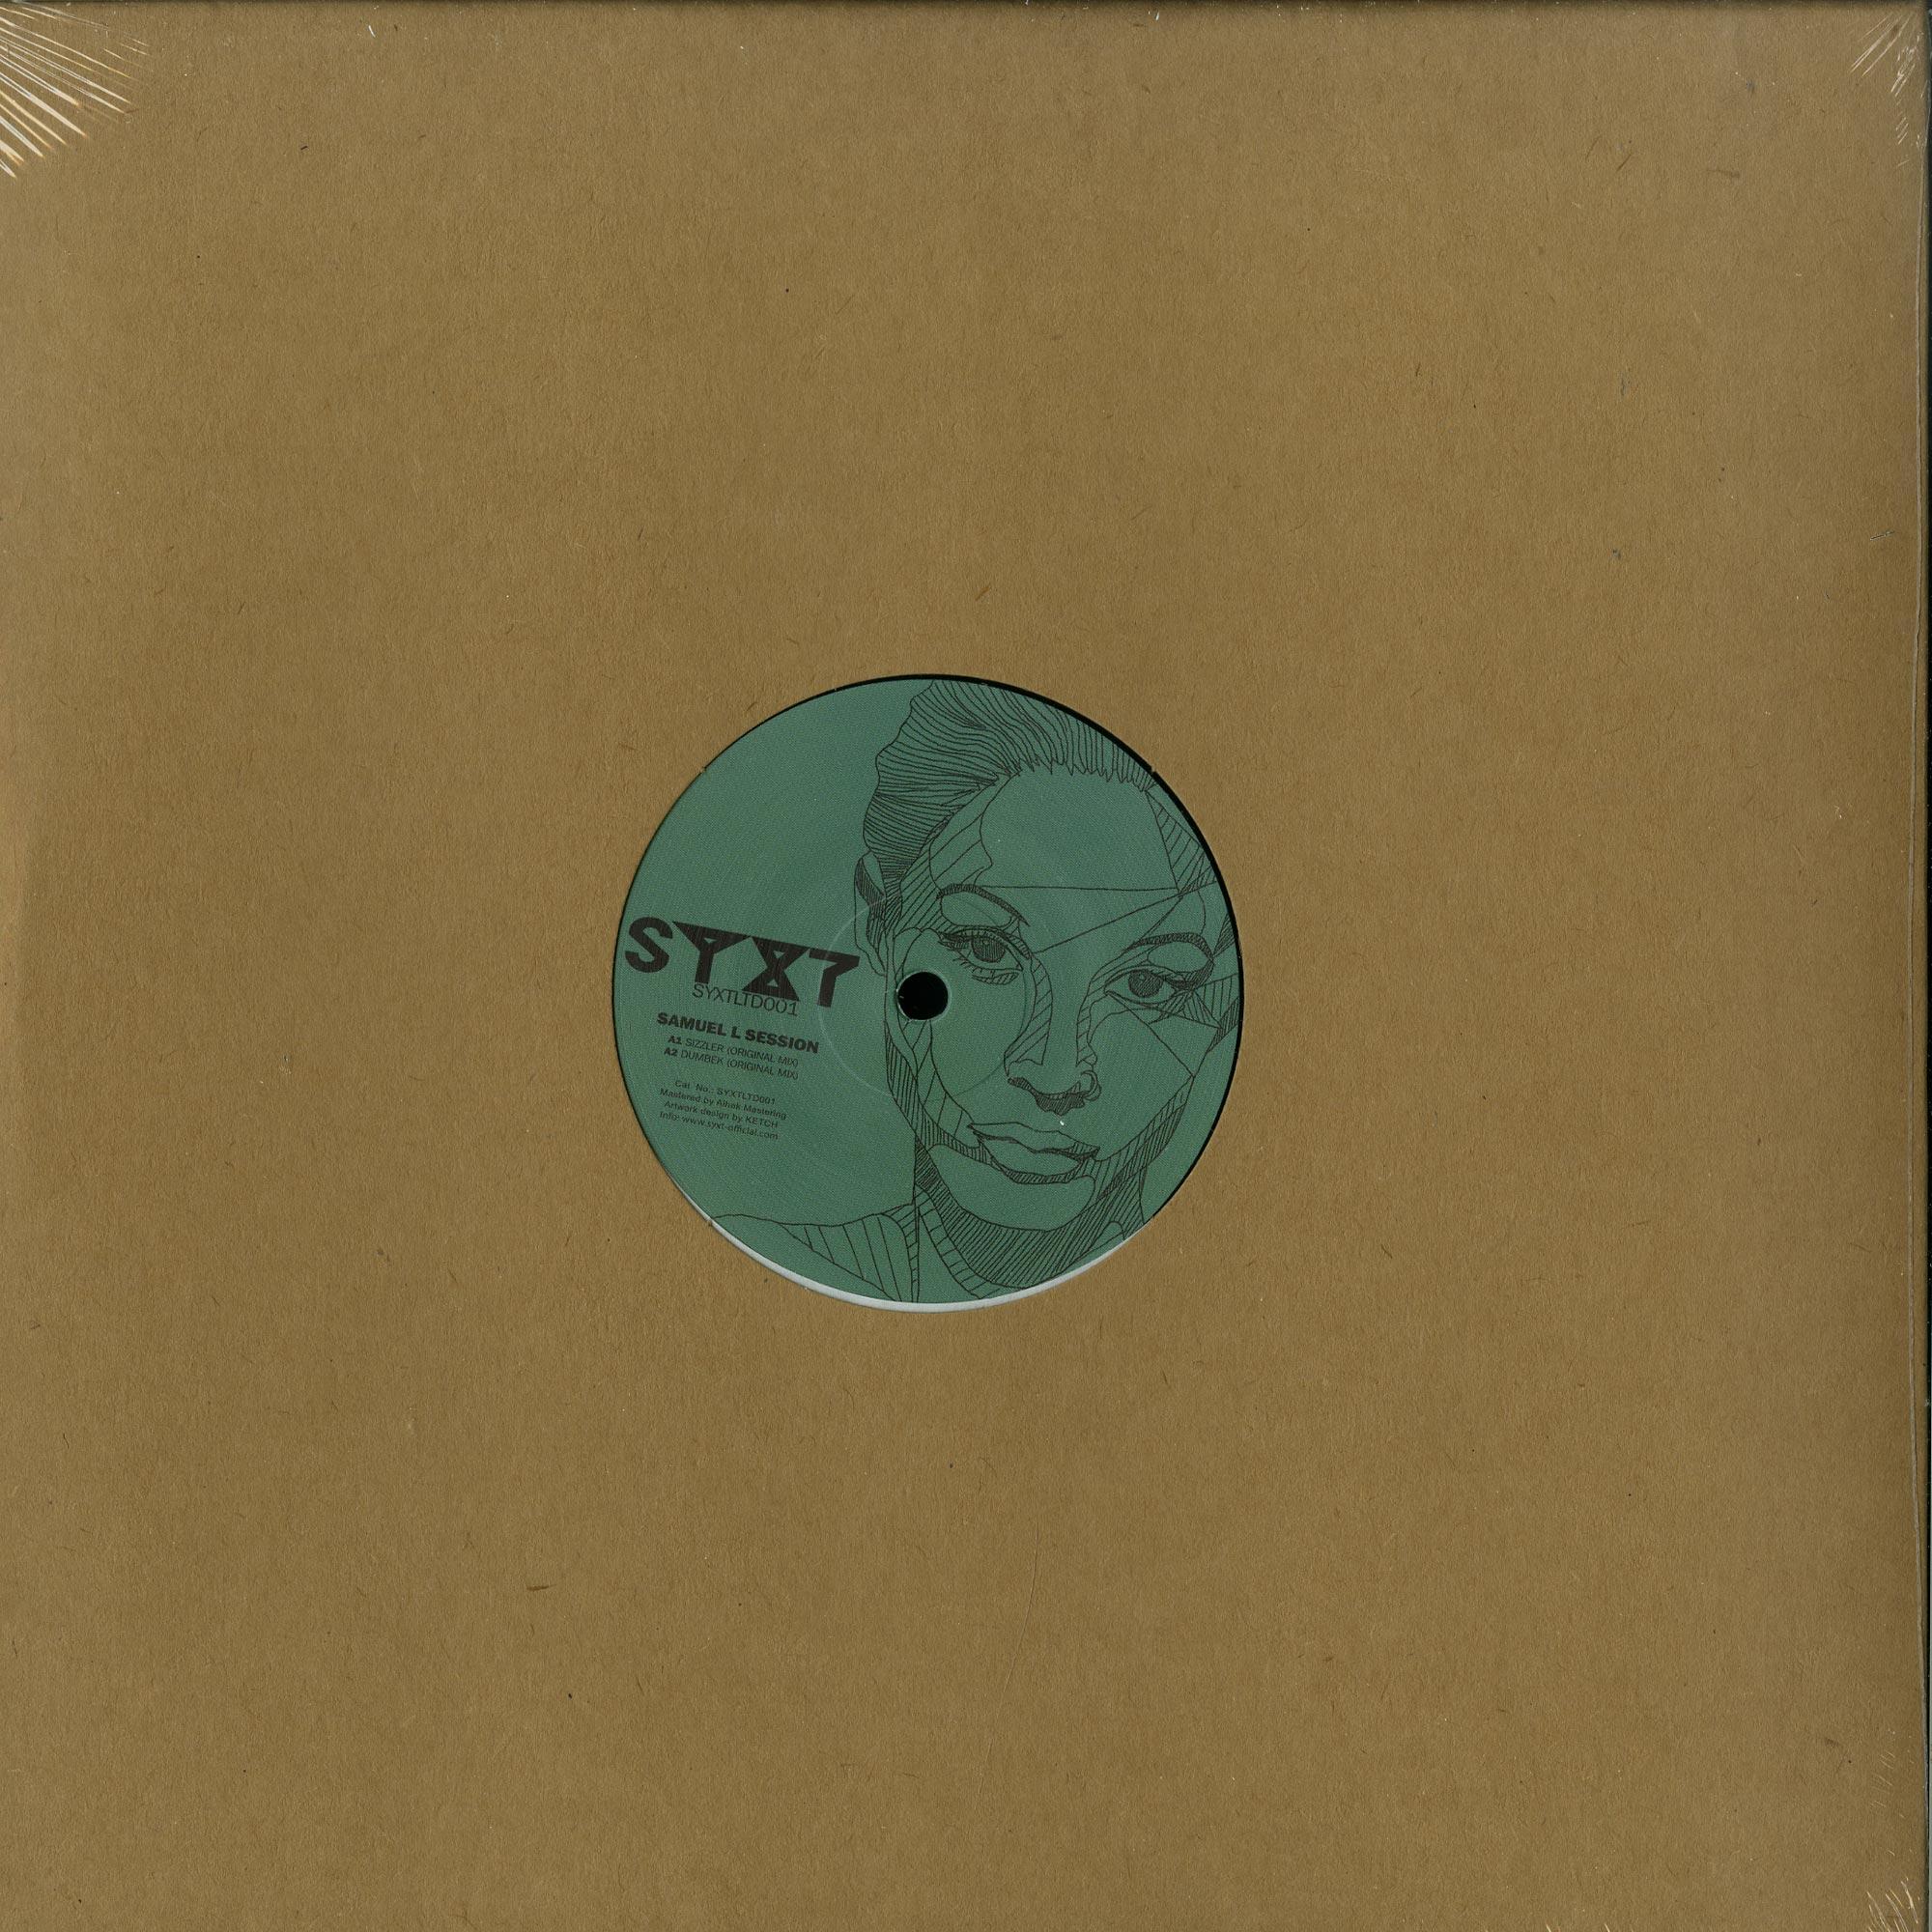 Samuel L Session - SYXTLTD 001